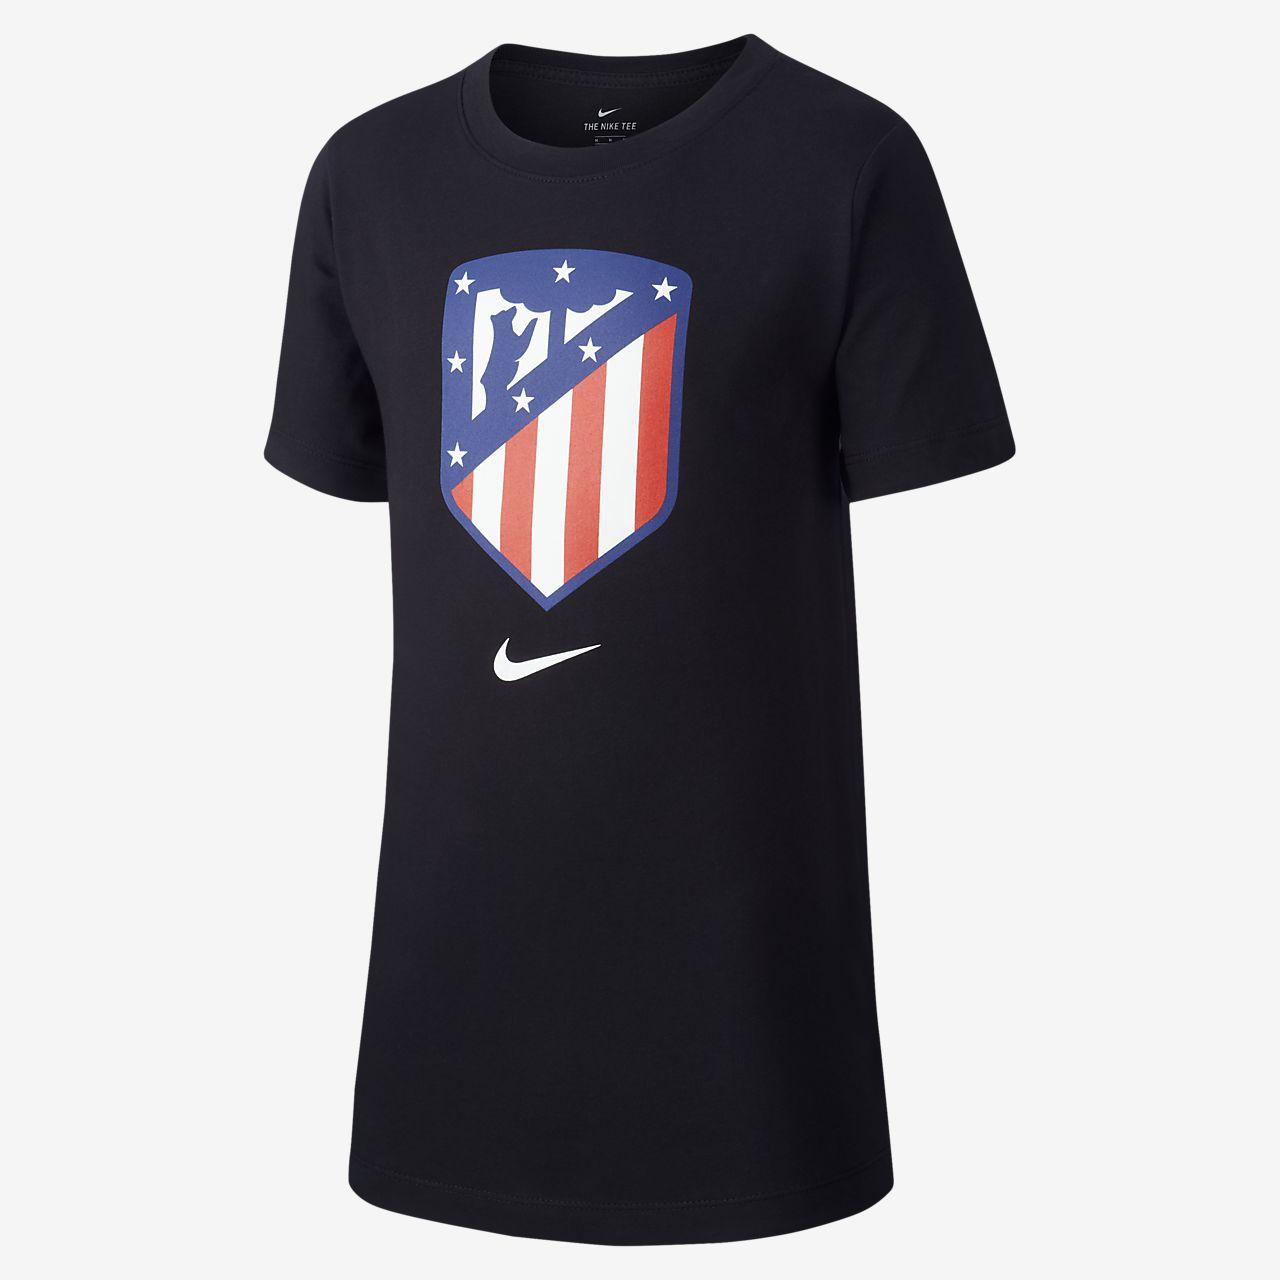 Atlético de Madrid Samarreta - Nen/a